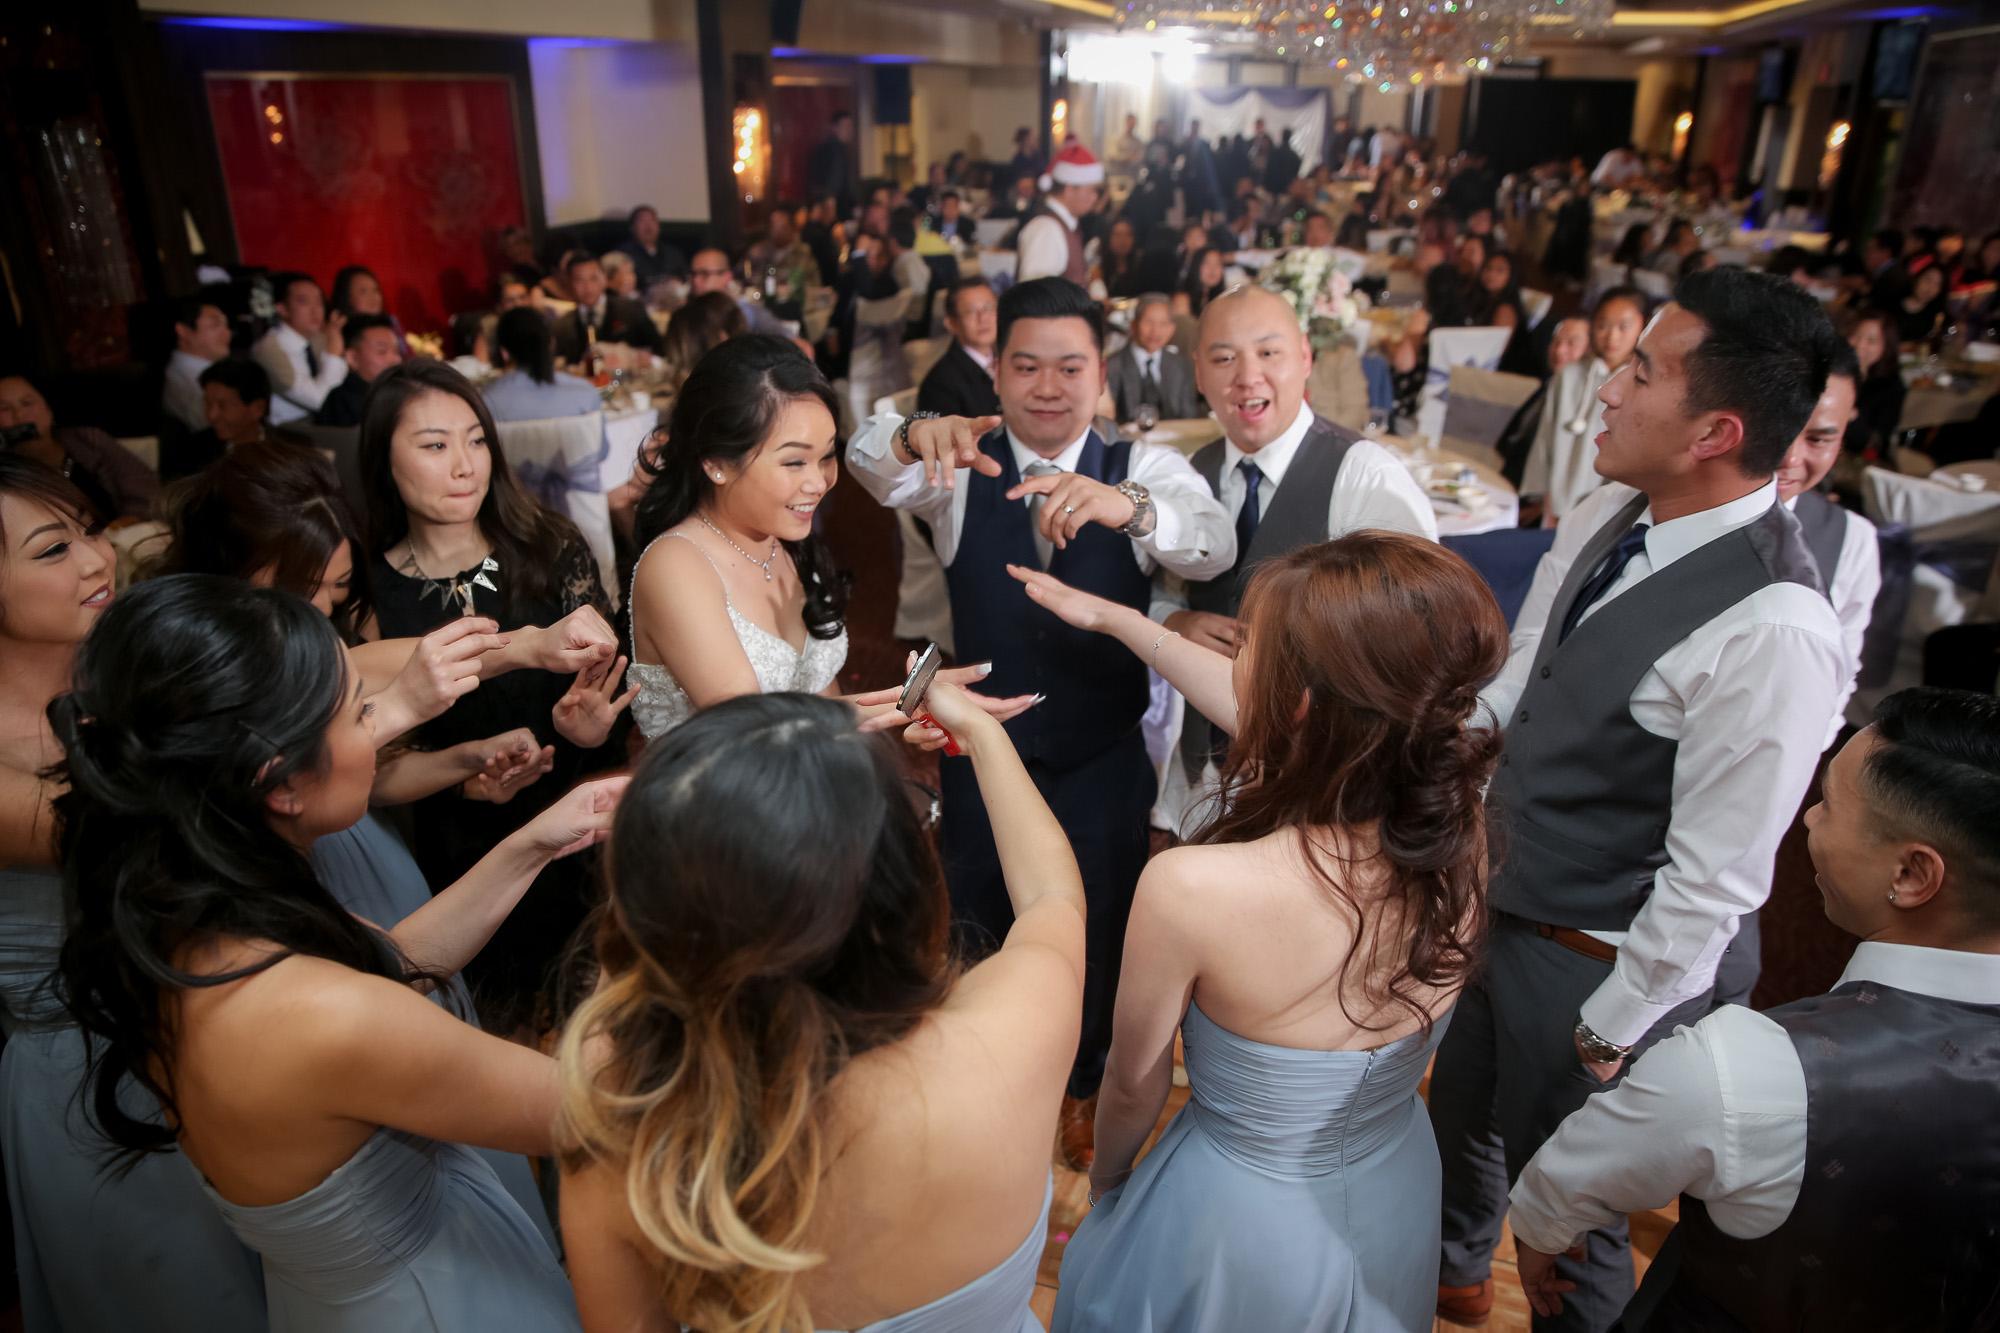 Geoff Kowalchuk JT Wedding Photo-023.jpg